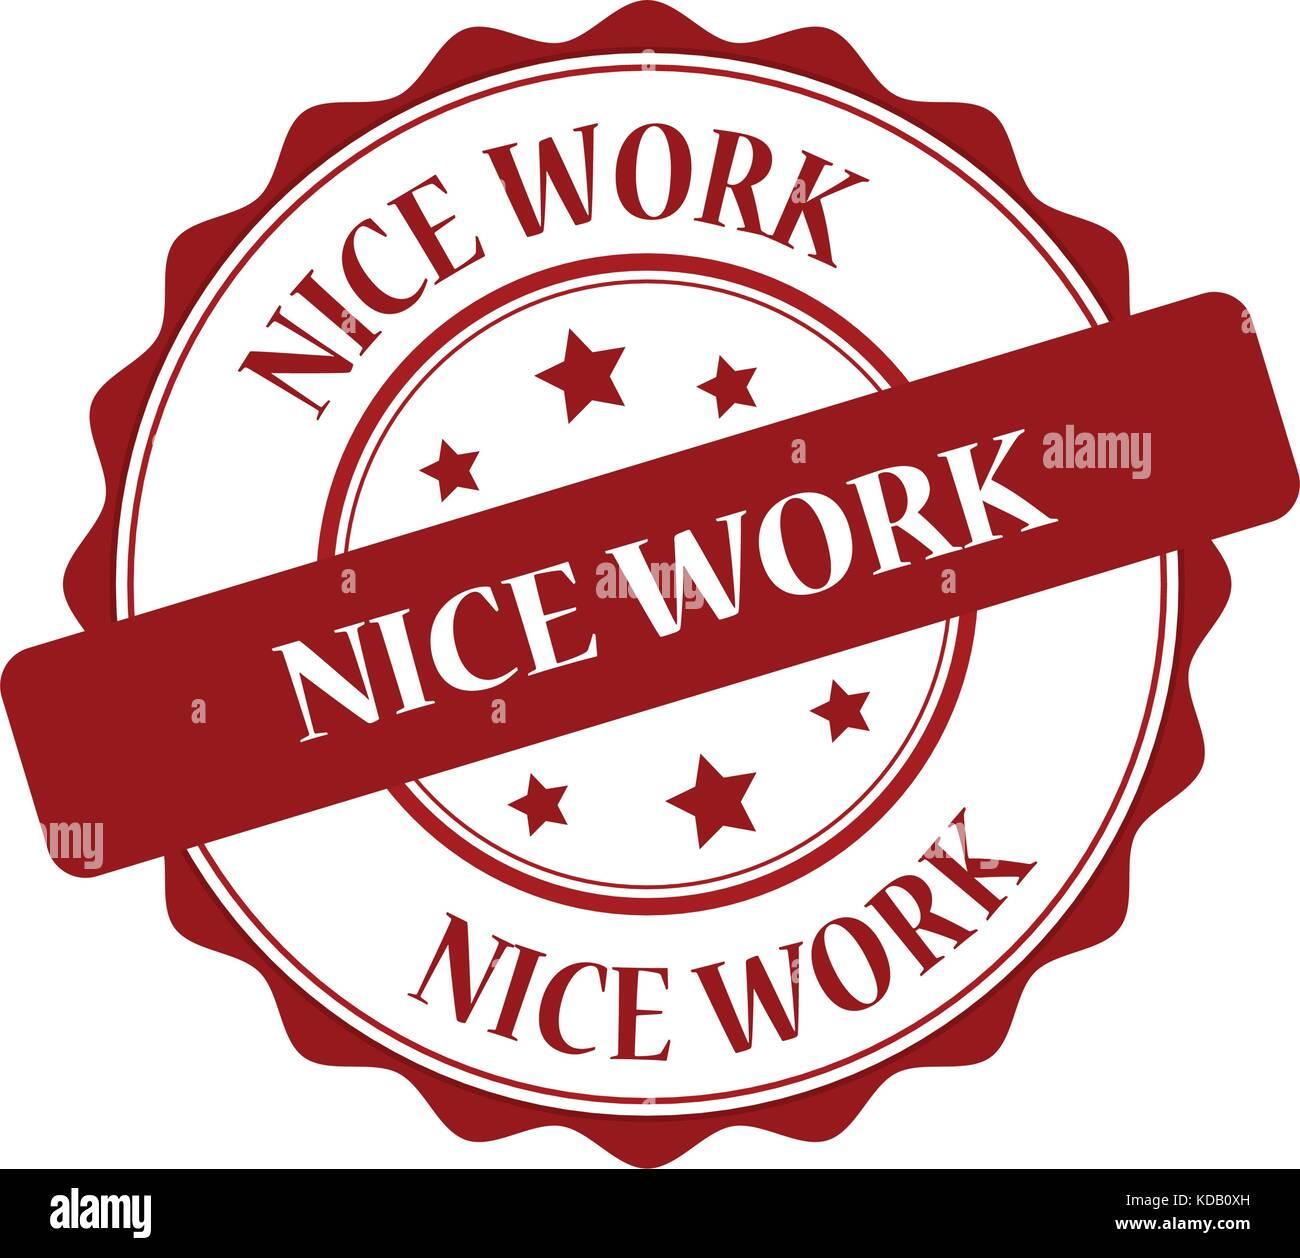 Nice Work Red Stamp Illustration Stock Vector Image Art Alamy